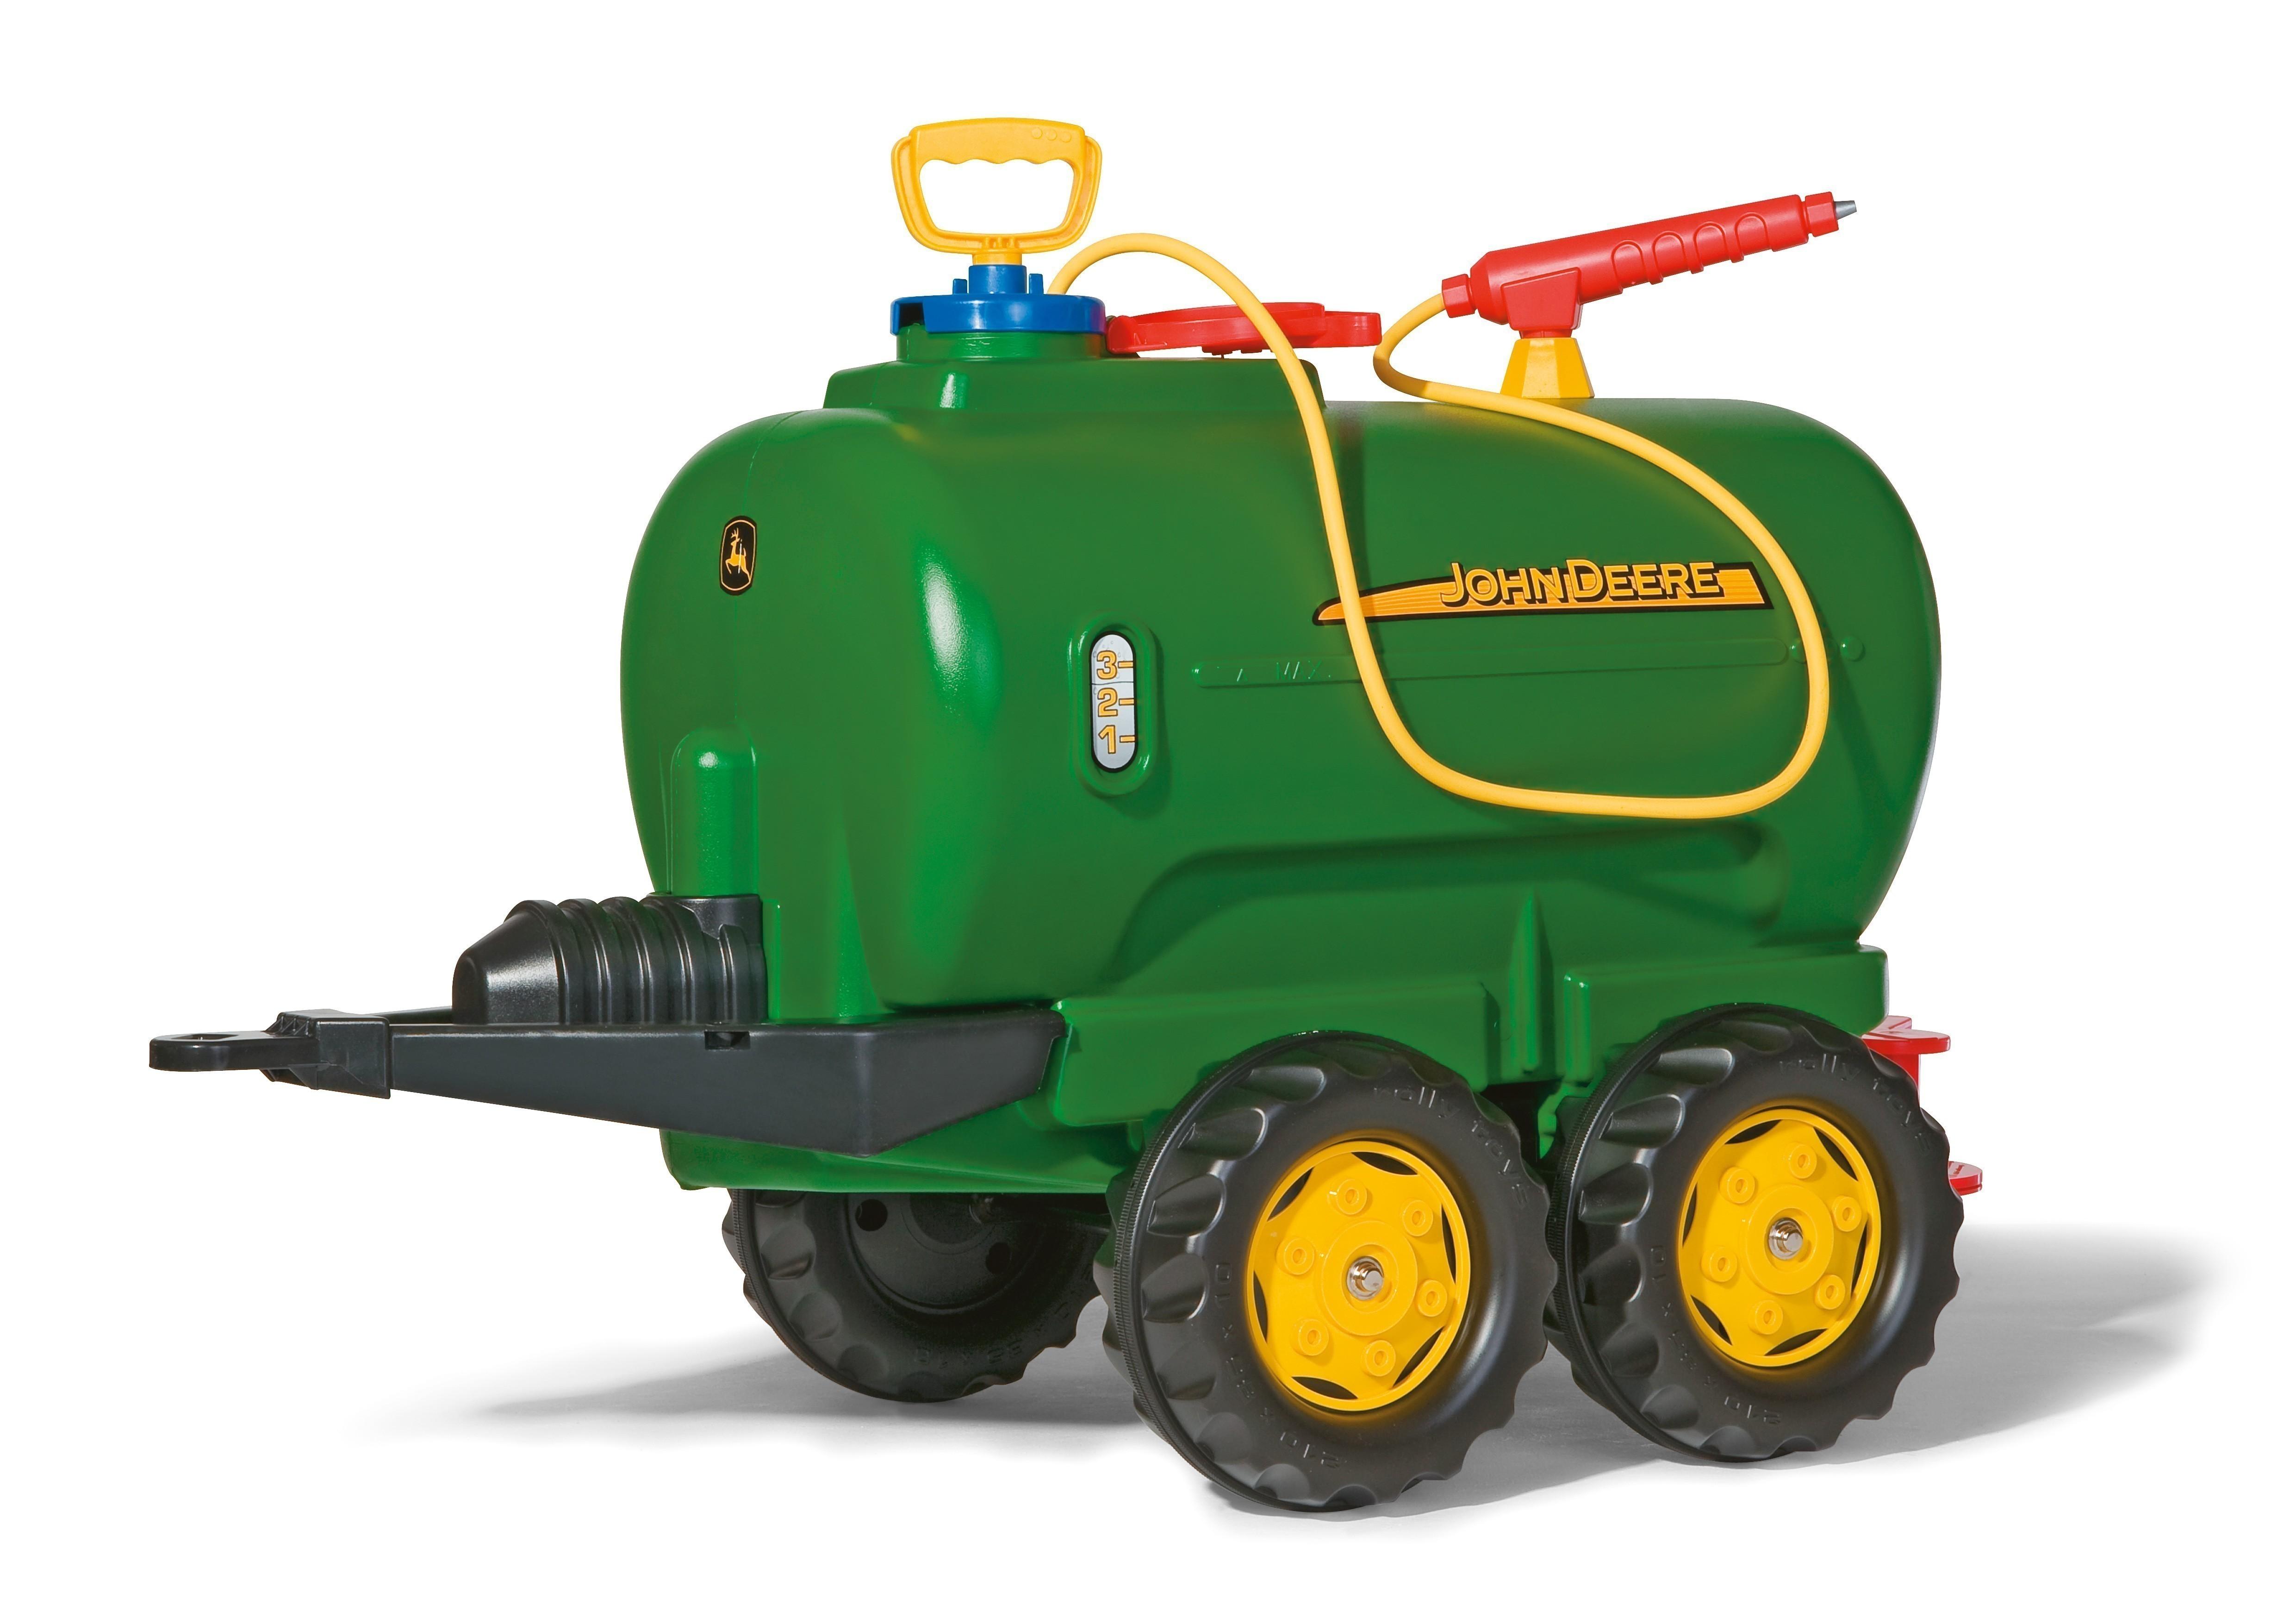 Anhänger für Tretfahrzeug rolly Tanker John Deere - Rolly Toys Bild 1